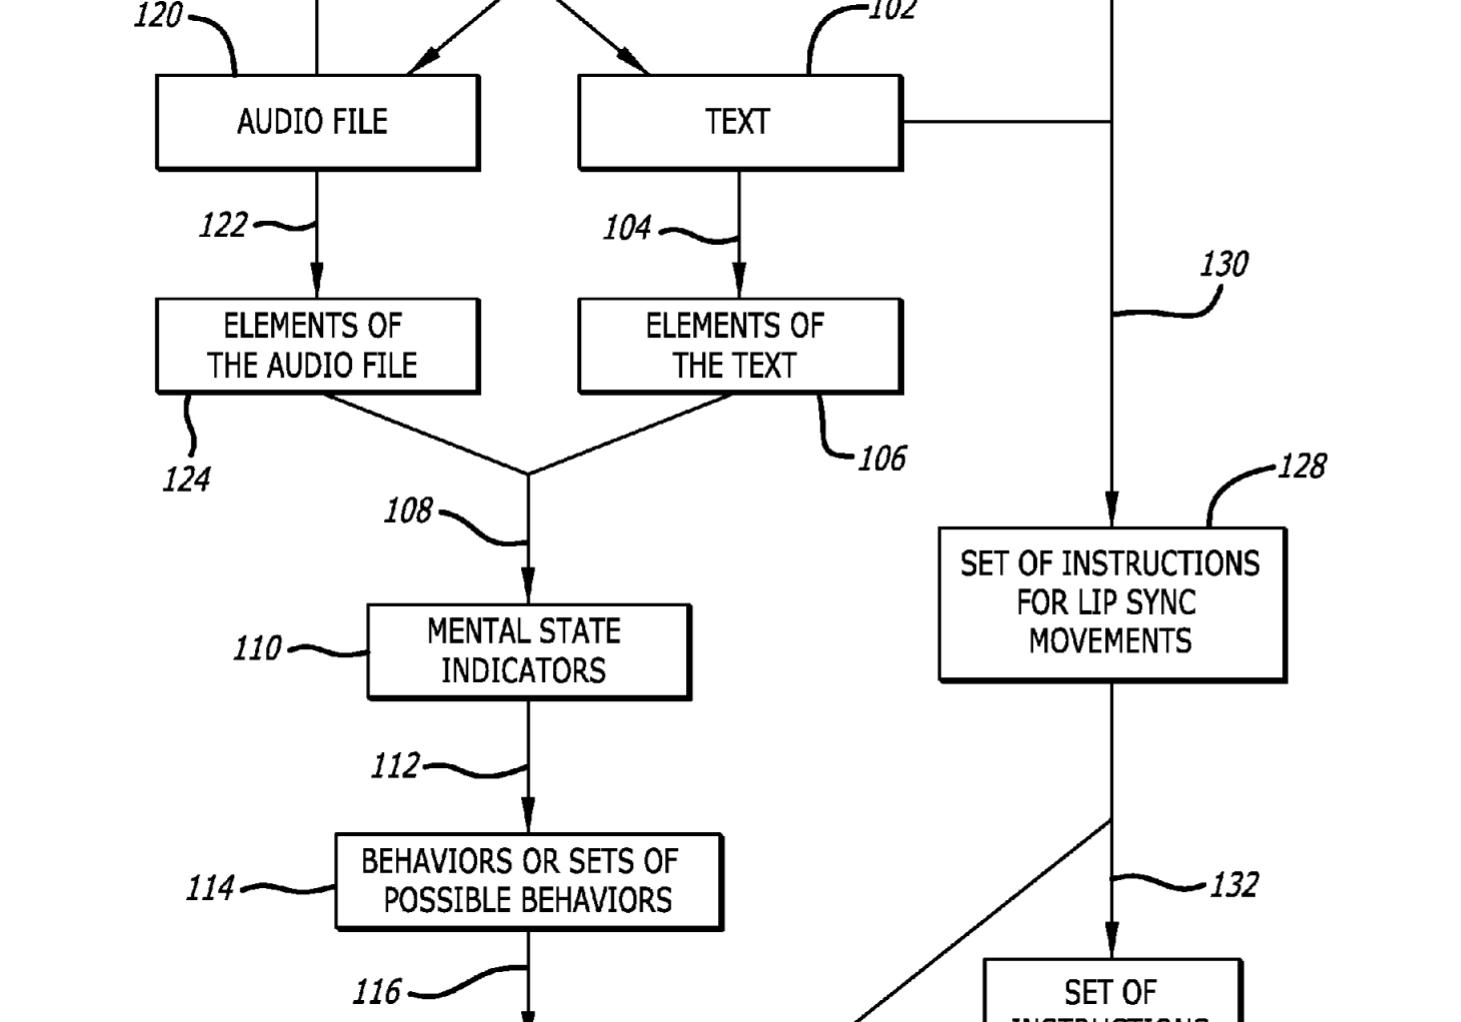 patentflow